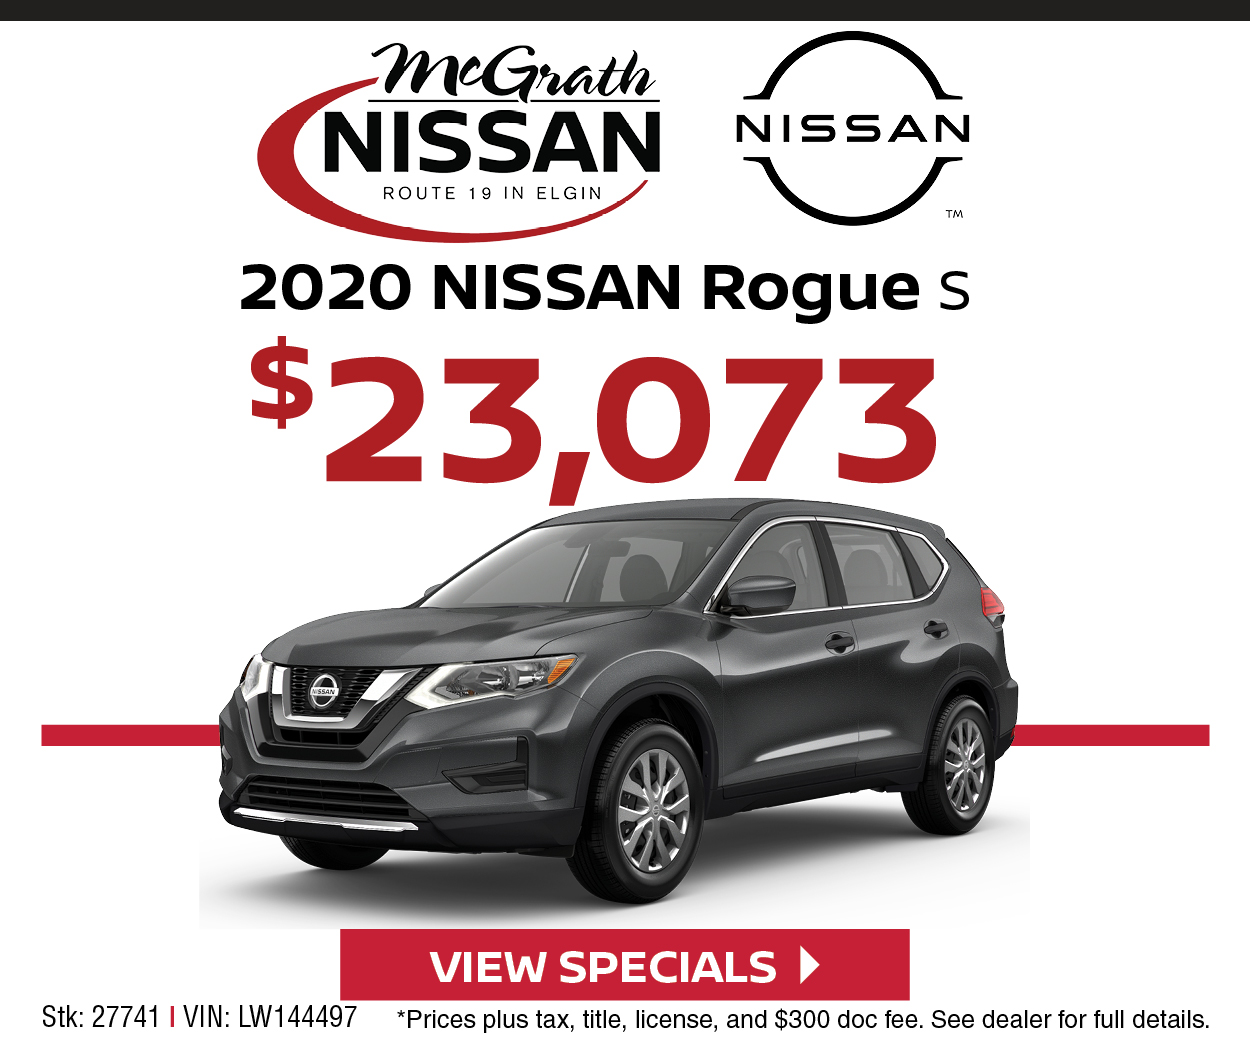 2020 Nissan Rogue S - $23,073